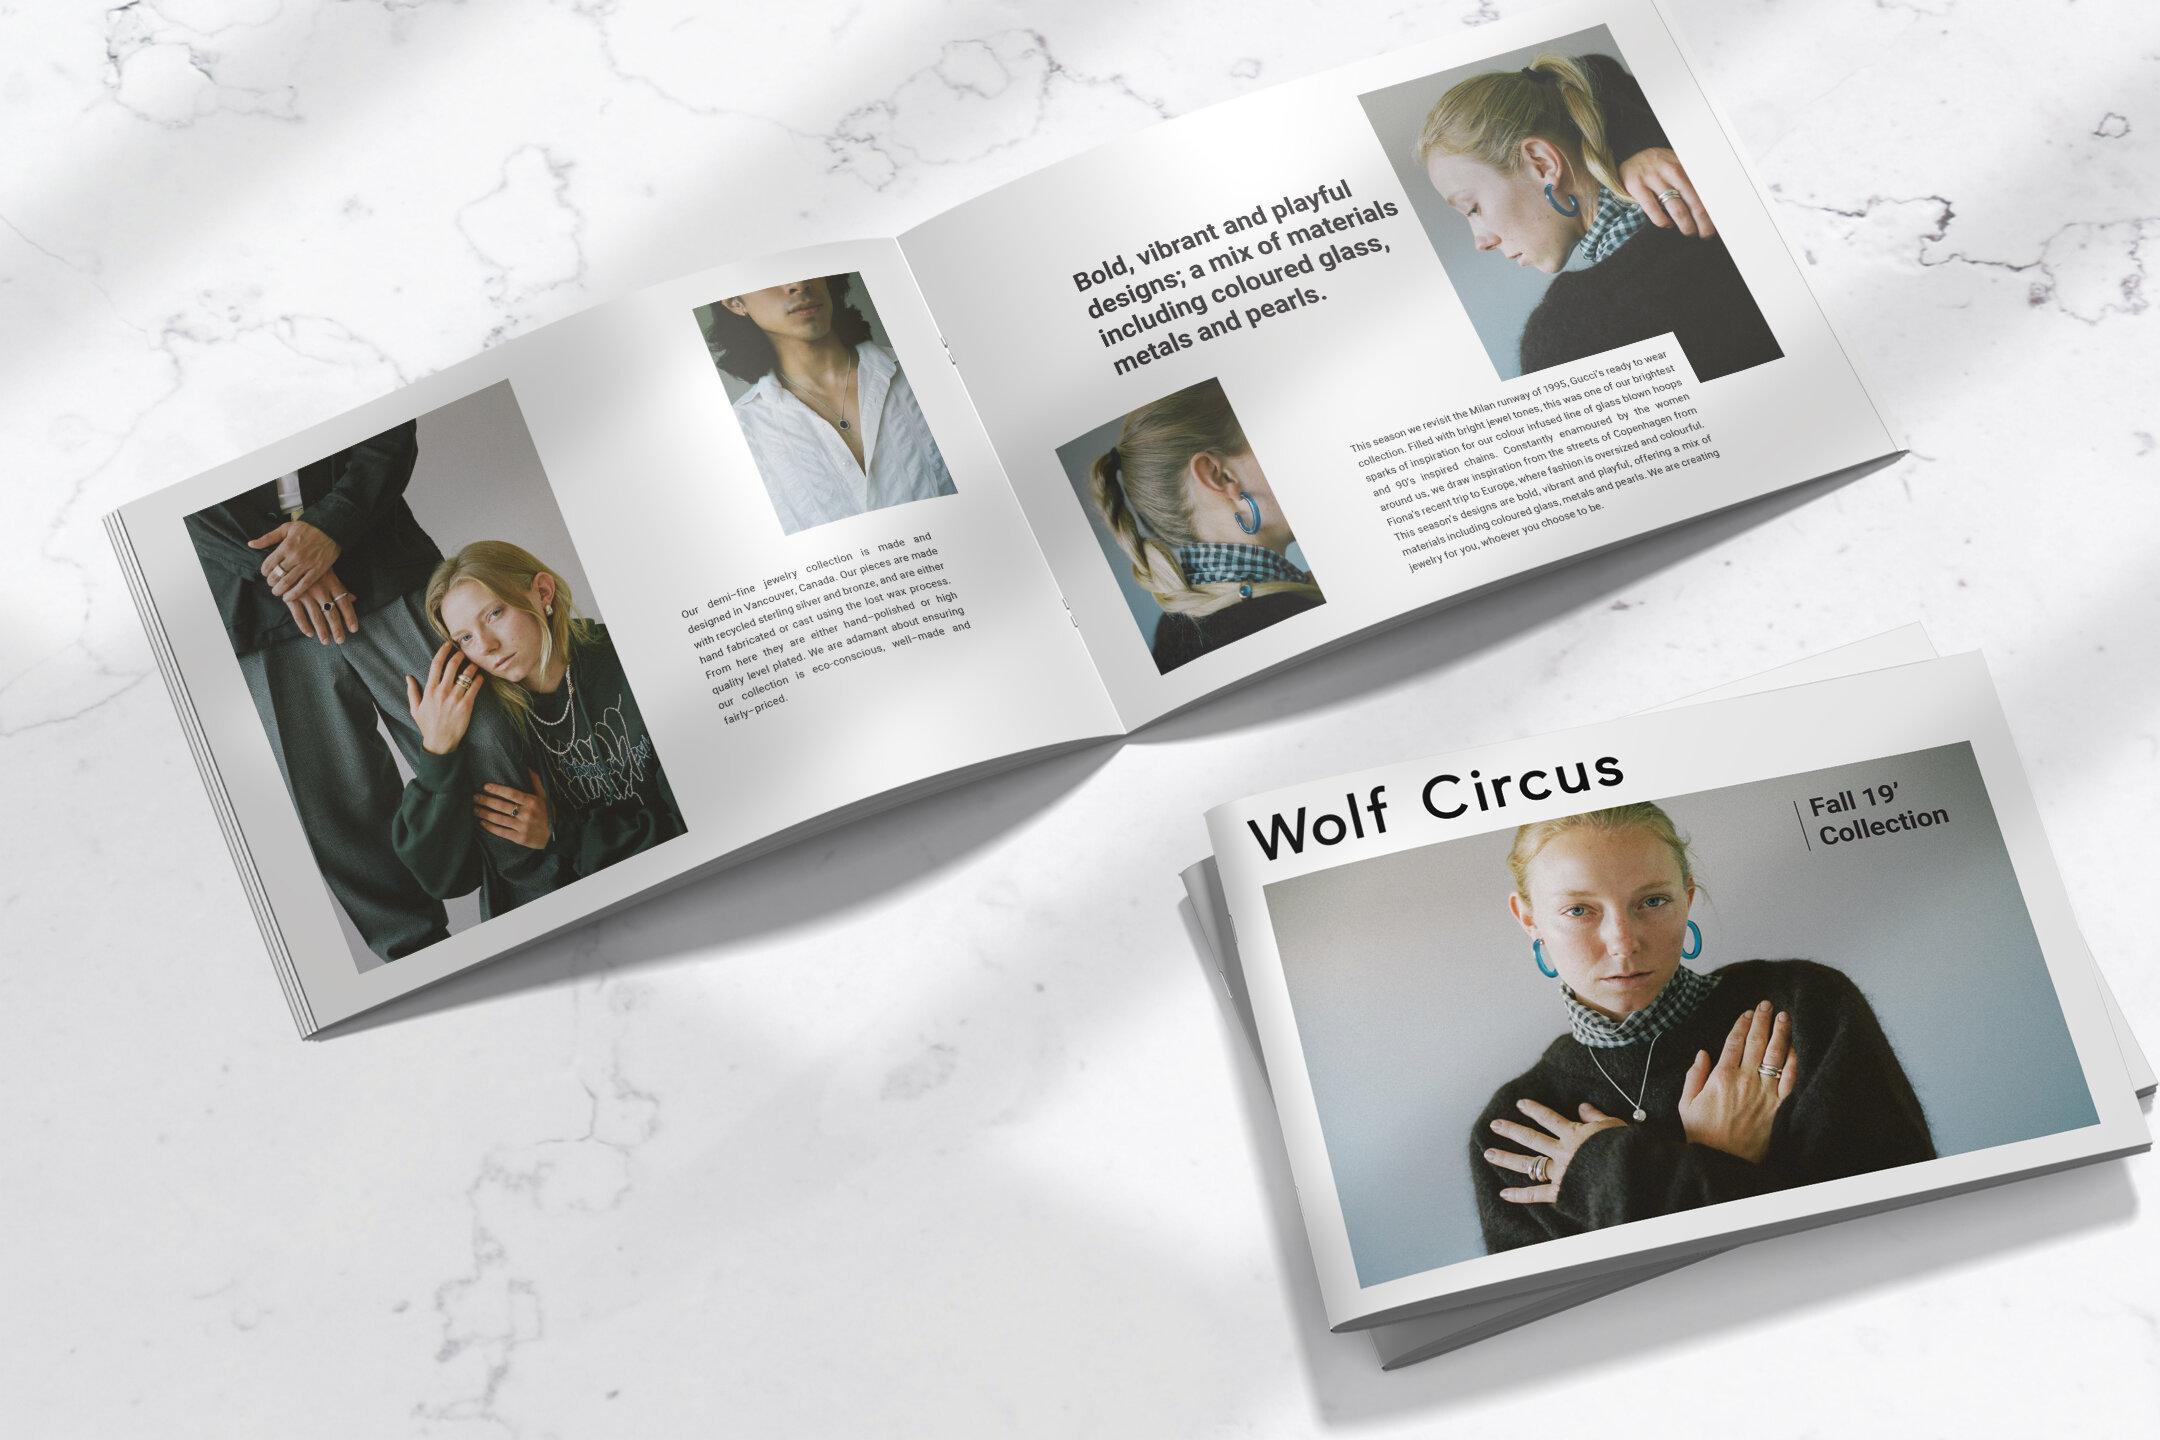 wolfcircus_04.jpg